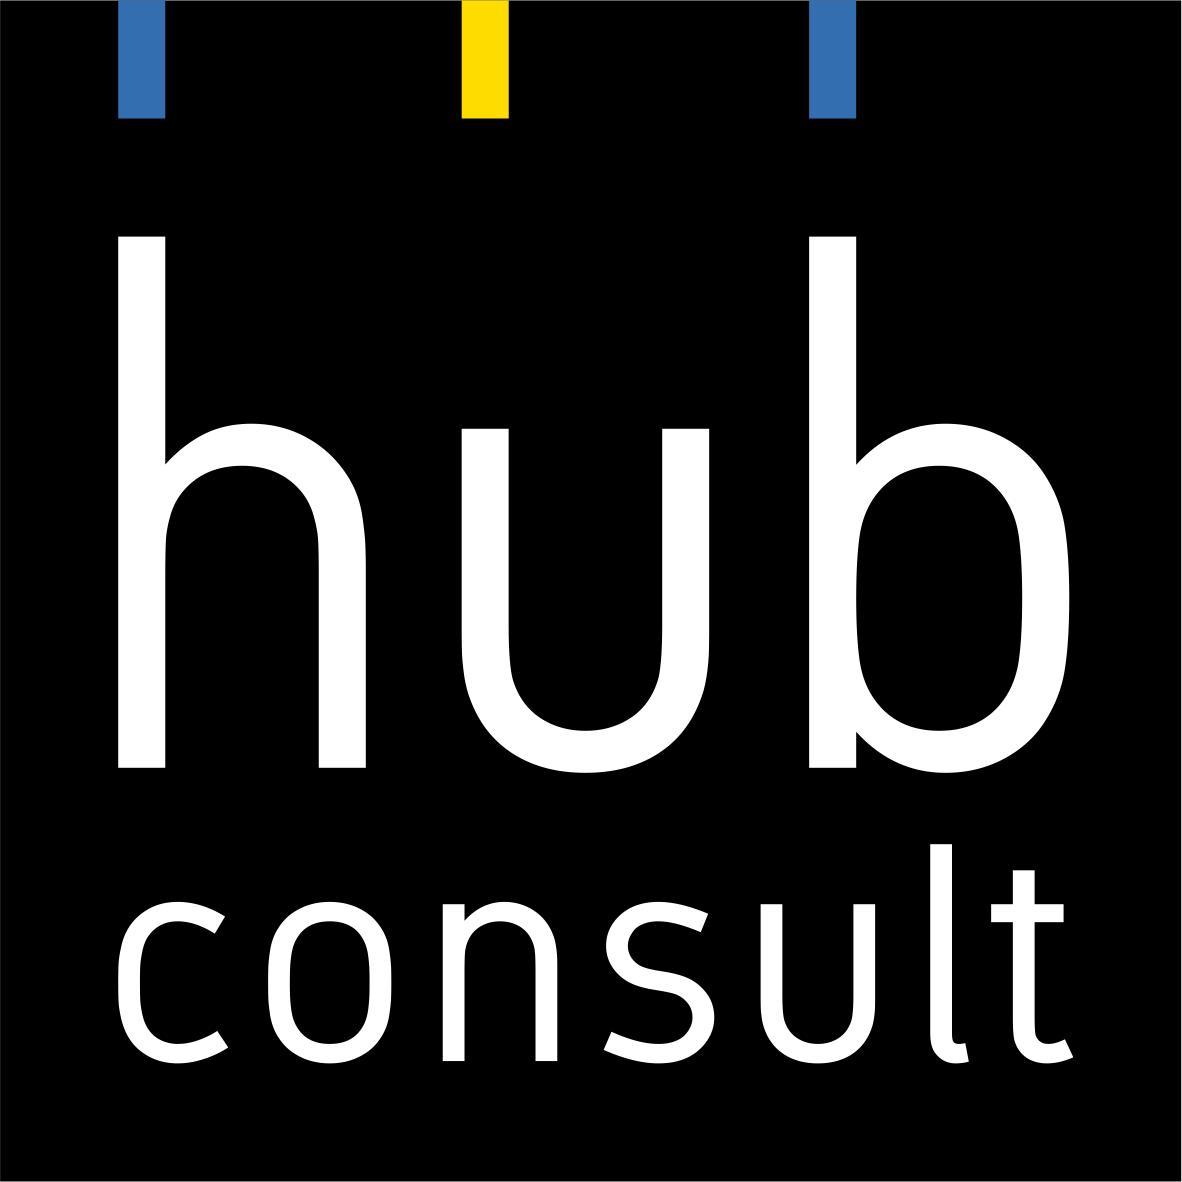 http://hub-consult.de/data/hub-consult-logo_rgb.png